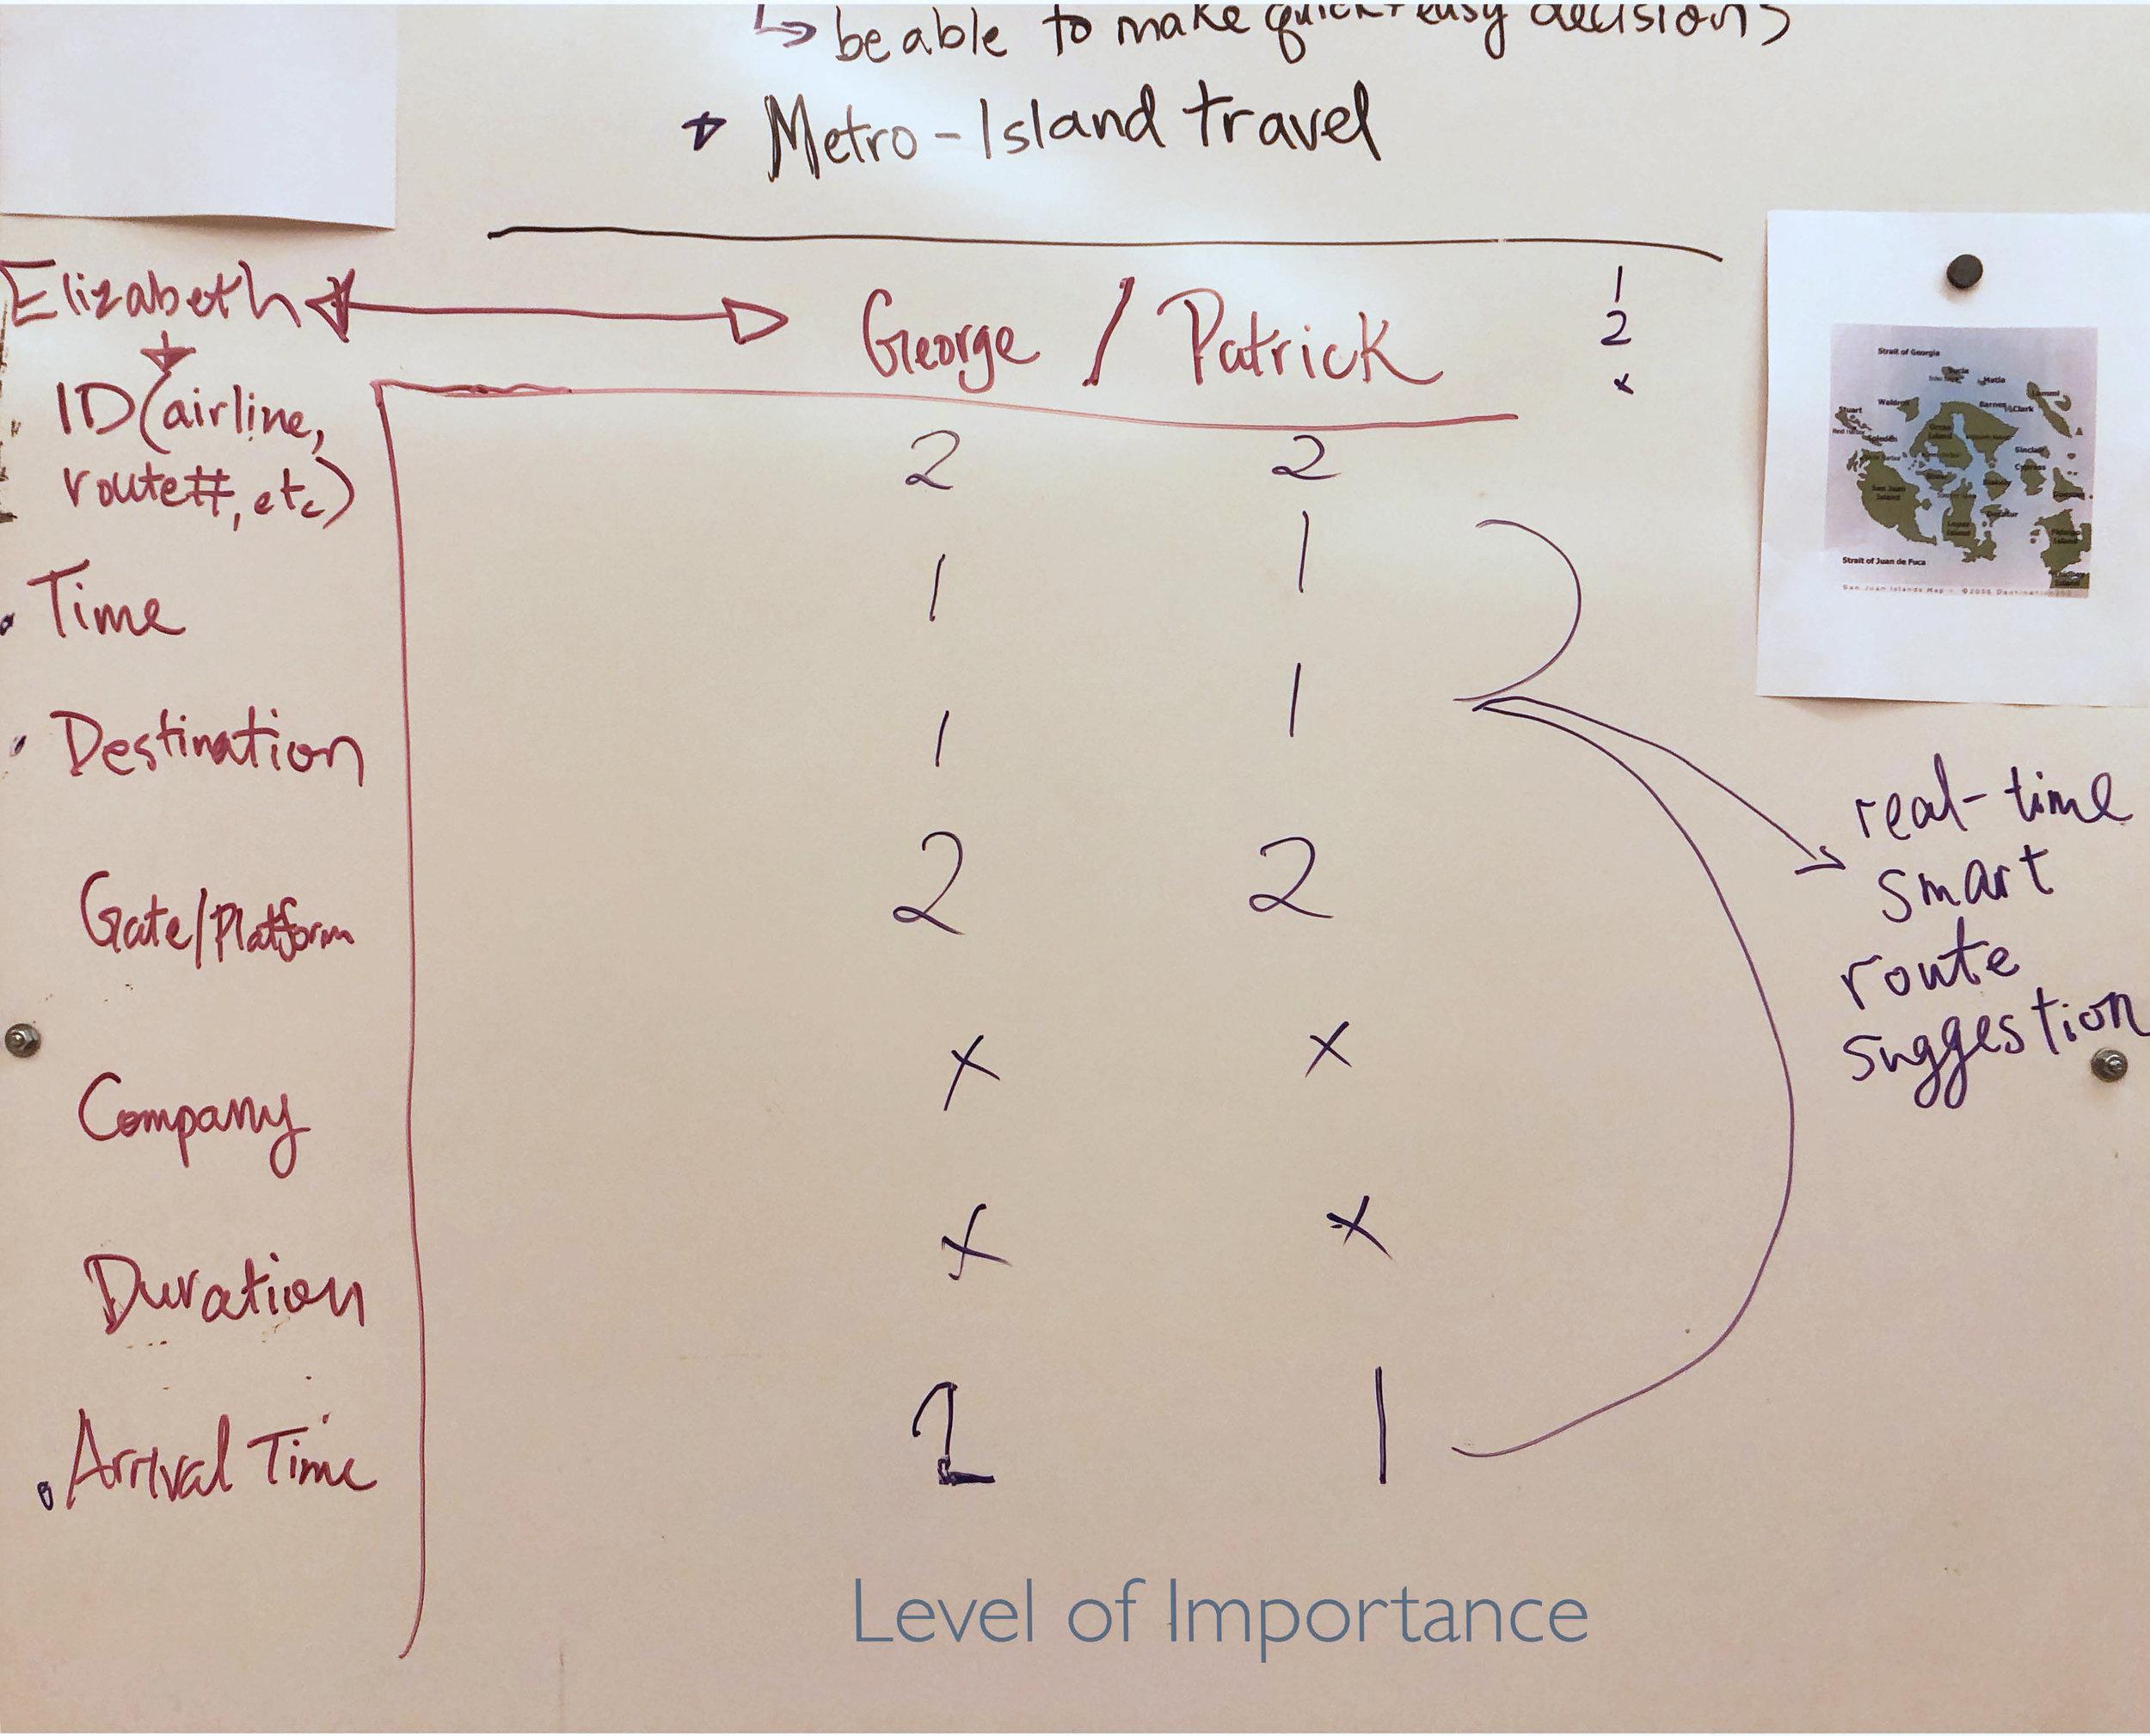 SHOW THE HIERARCHY - Time & Destination